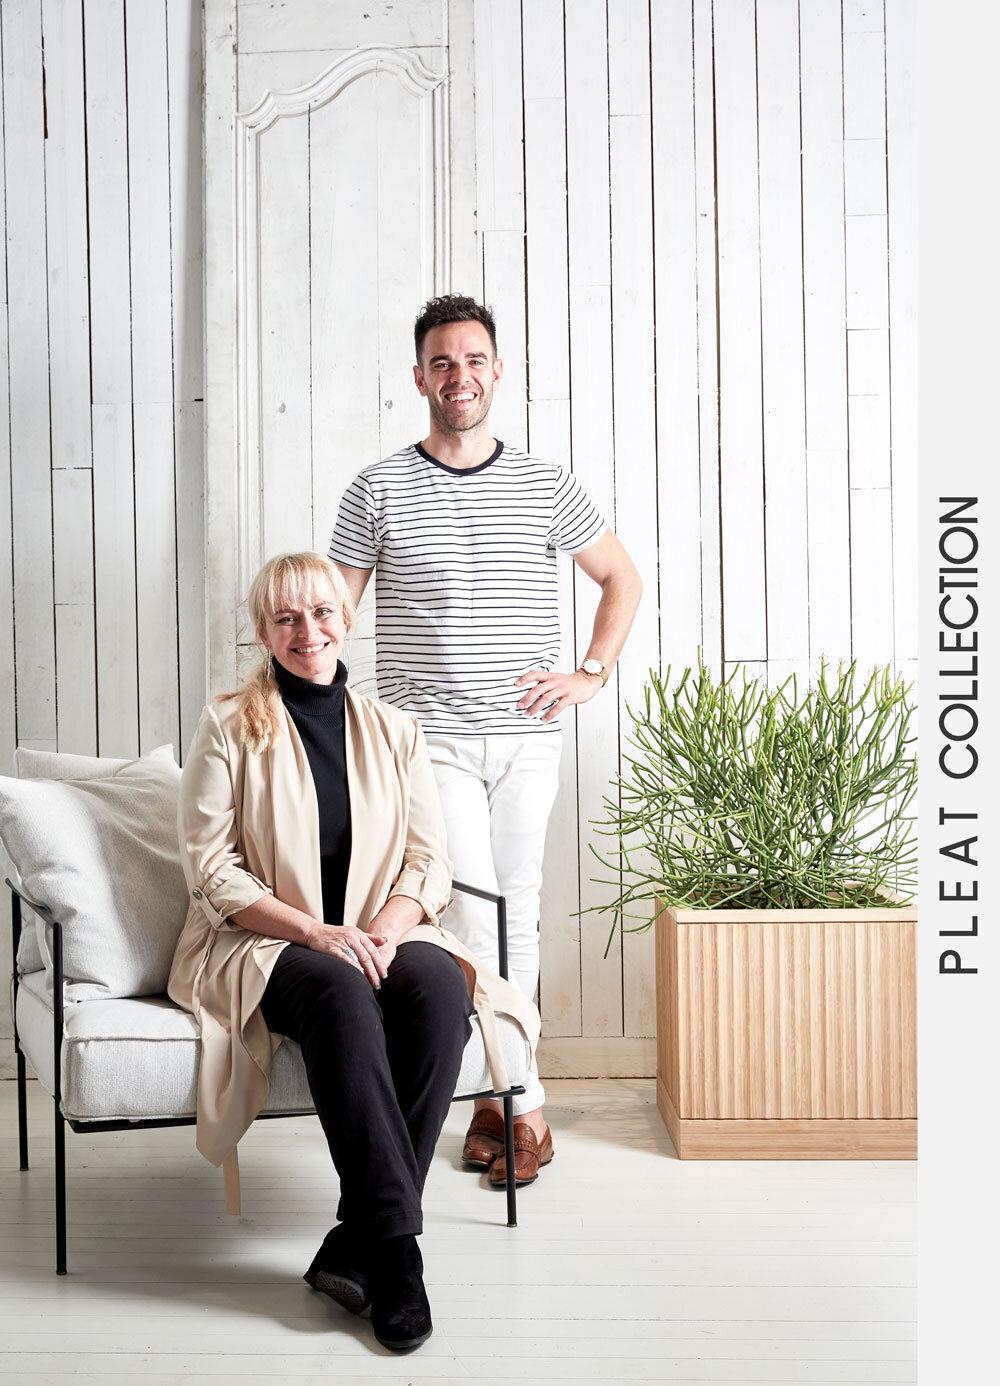 ©-Adam-Robinson-Design-Blog-Adam-Robinson's-PLEAT-COLLECTION-for-House-of-Bamboo.jpg